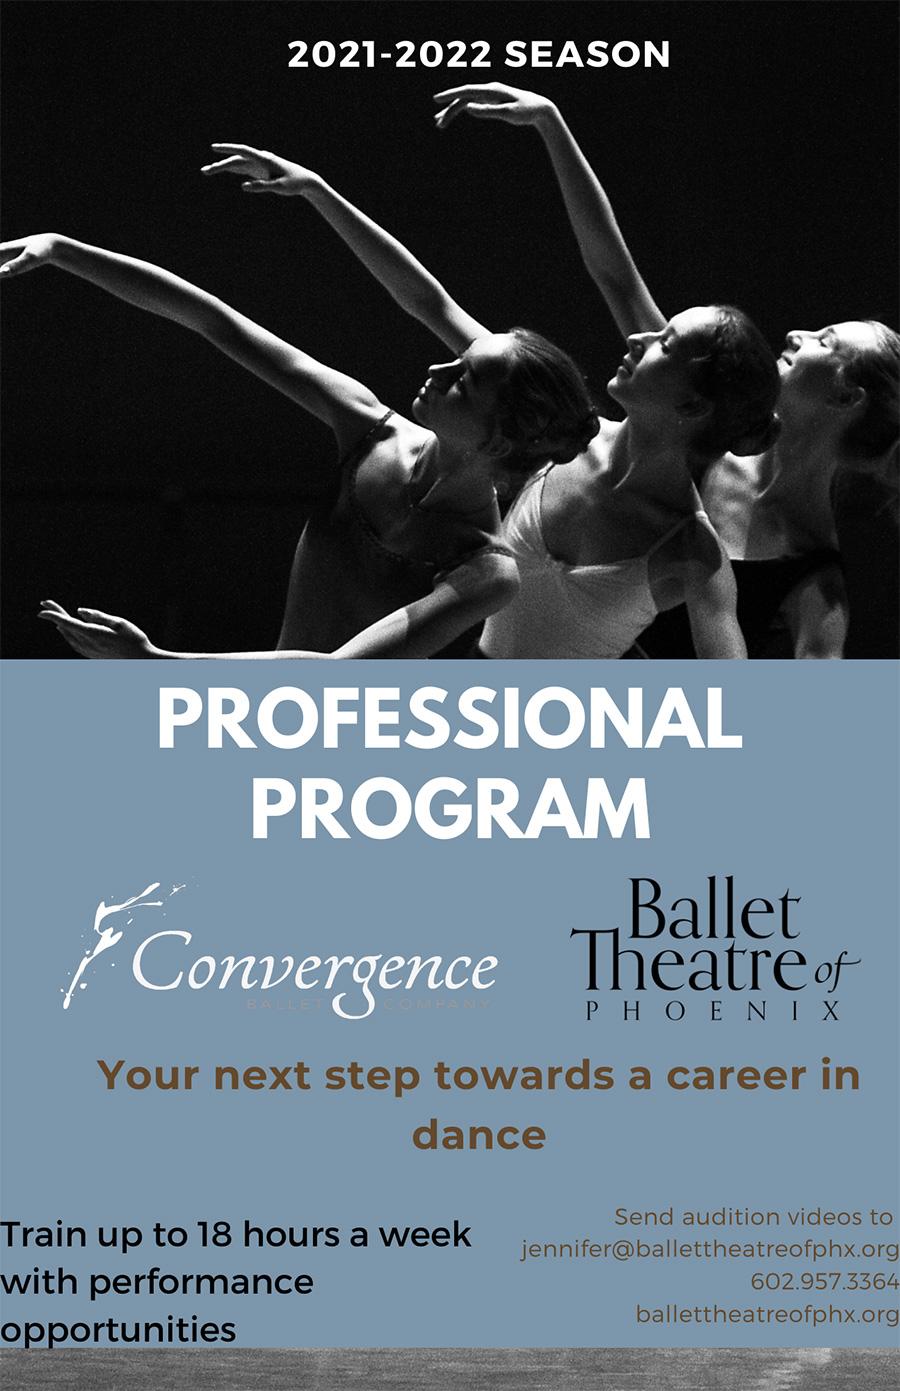 2021-2022 Professional Program